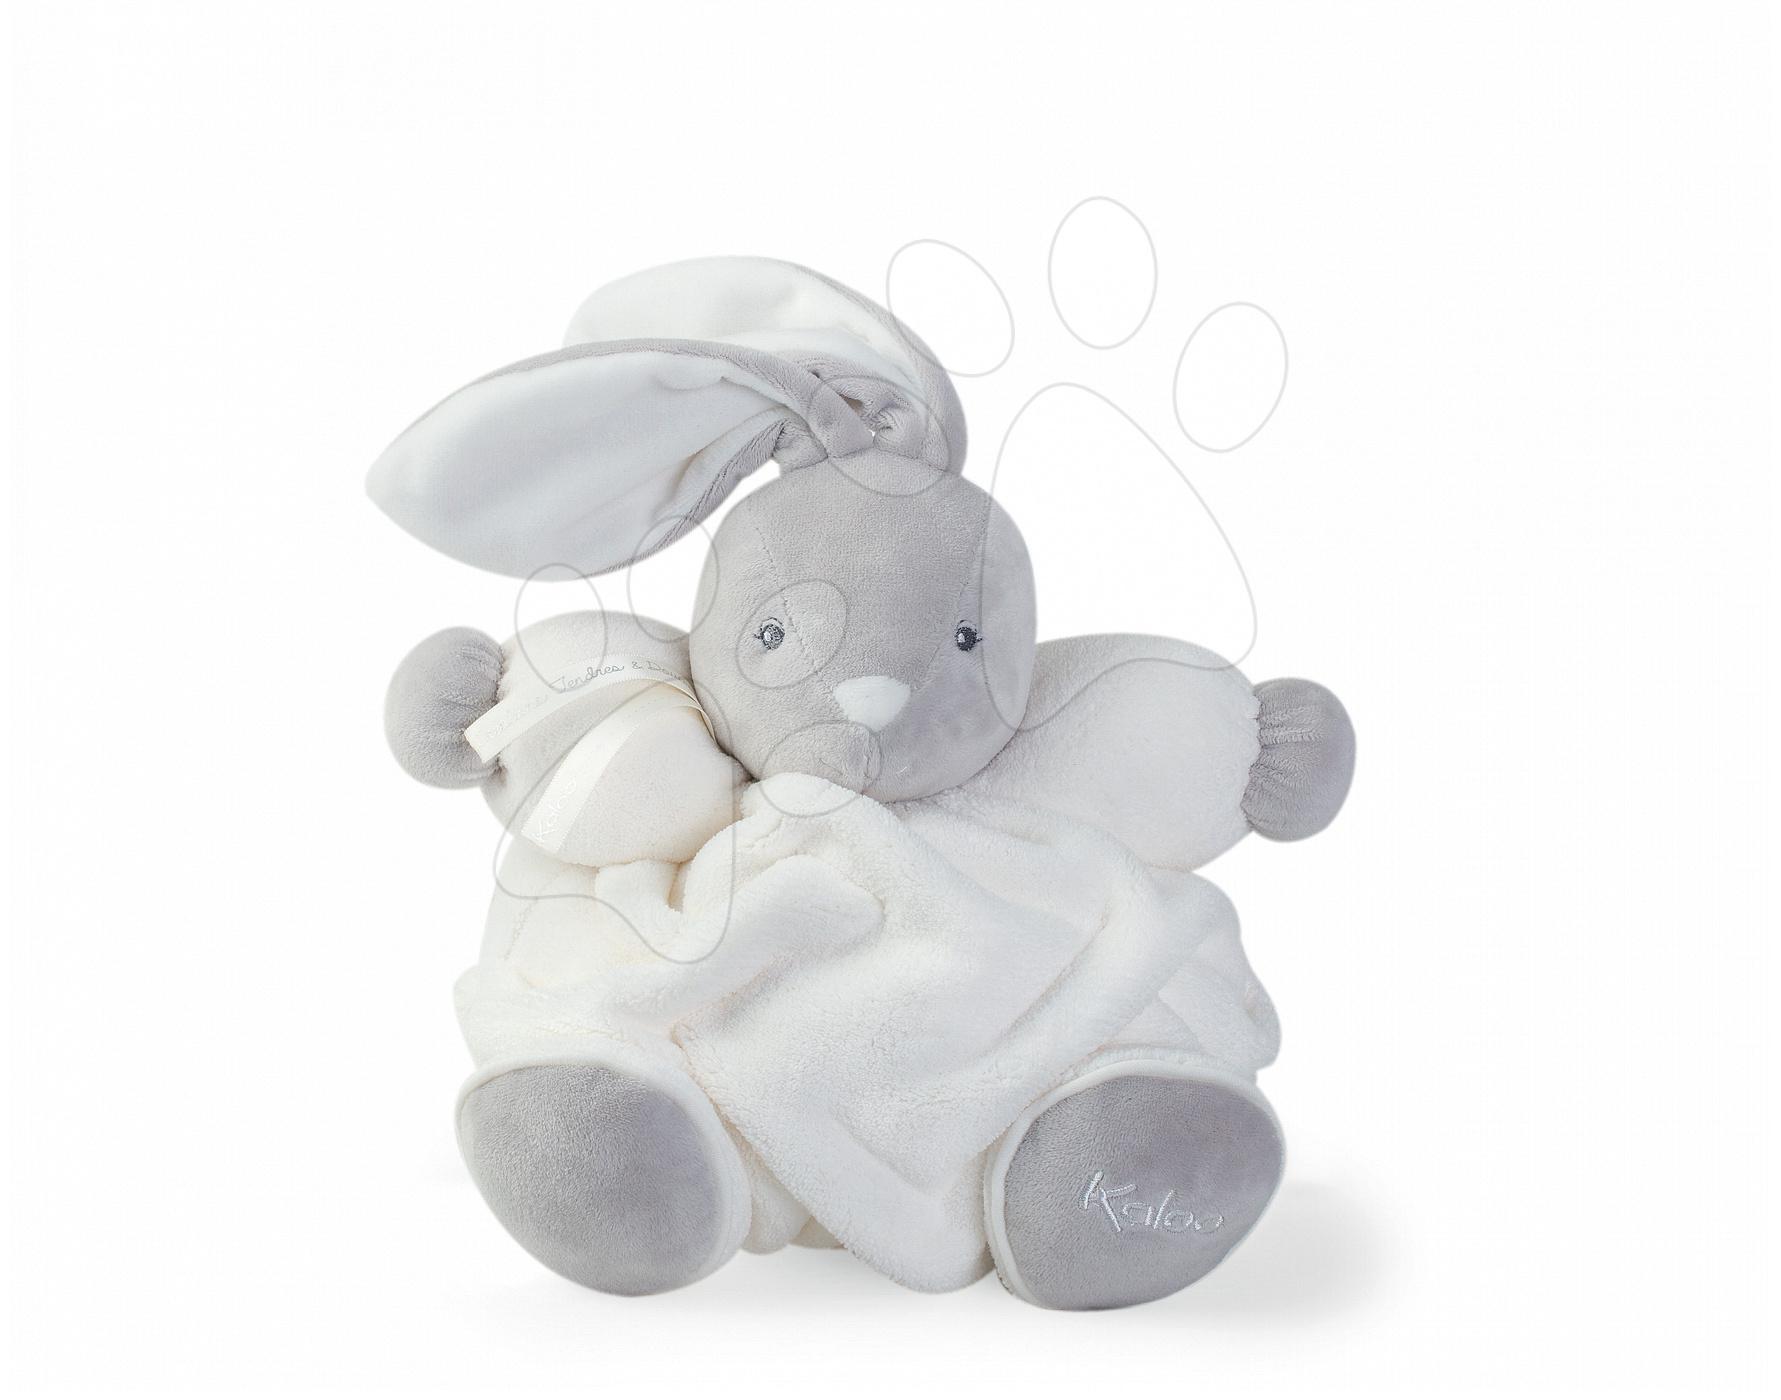 Kaloo plyšový zajačik Plume Chubby 25 cm 969553 krémový